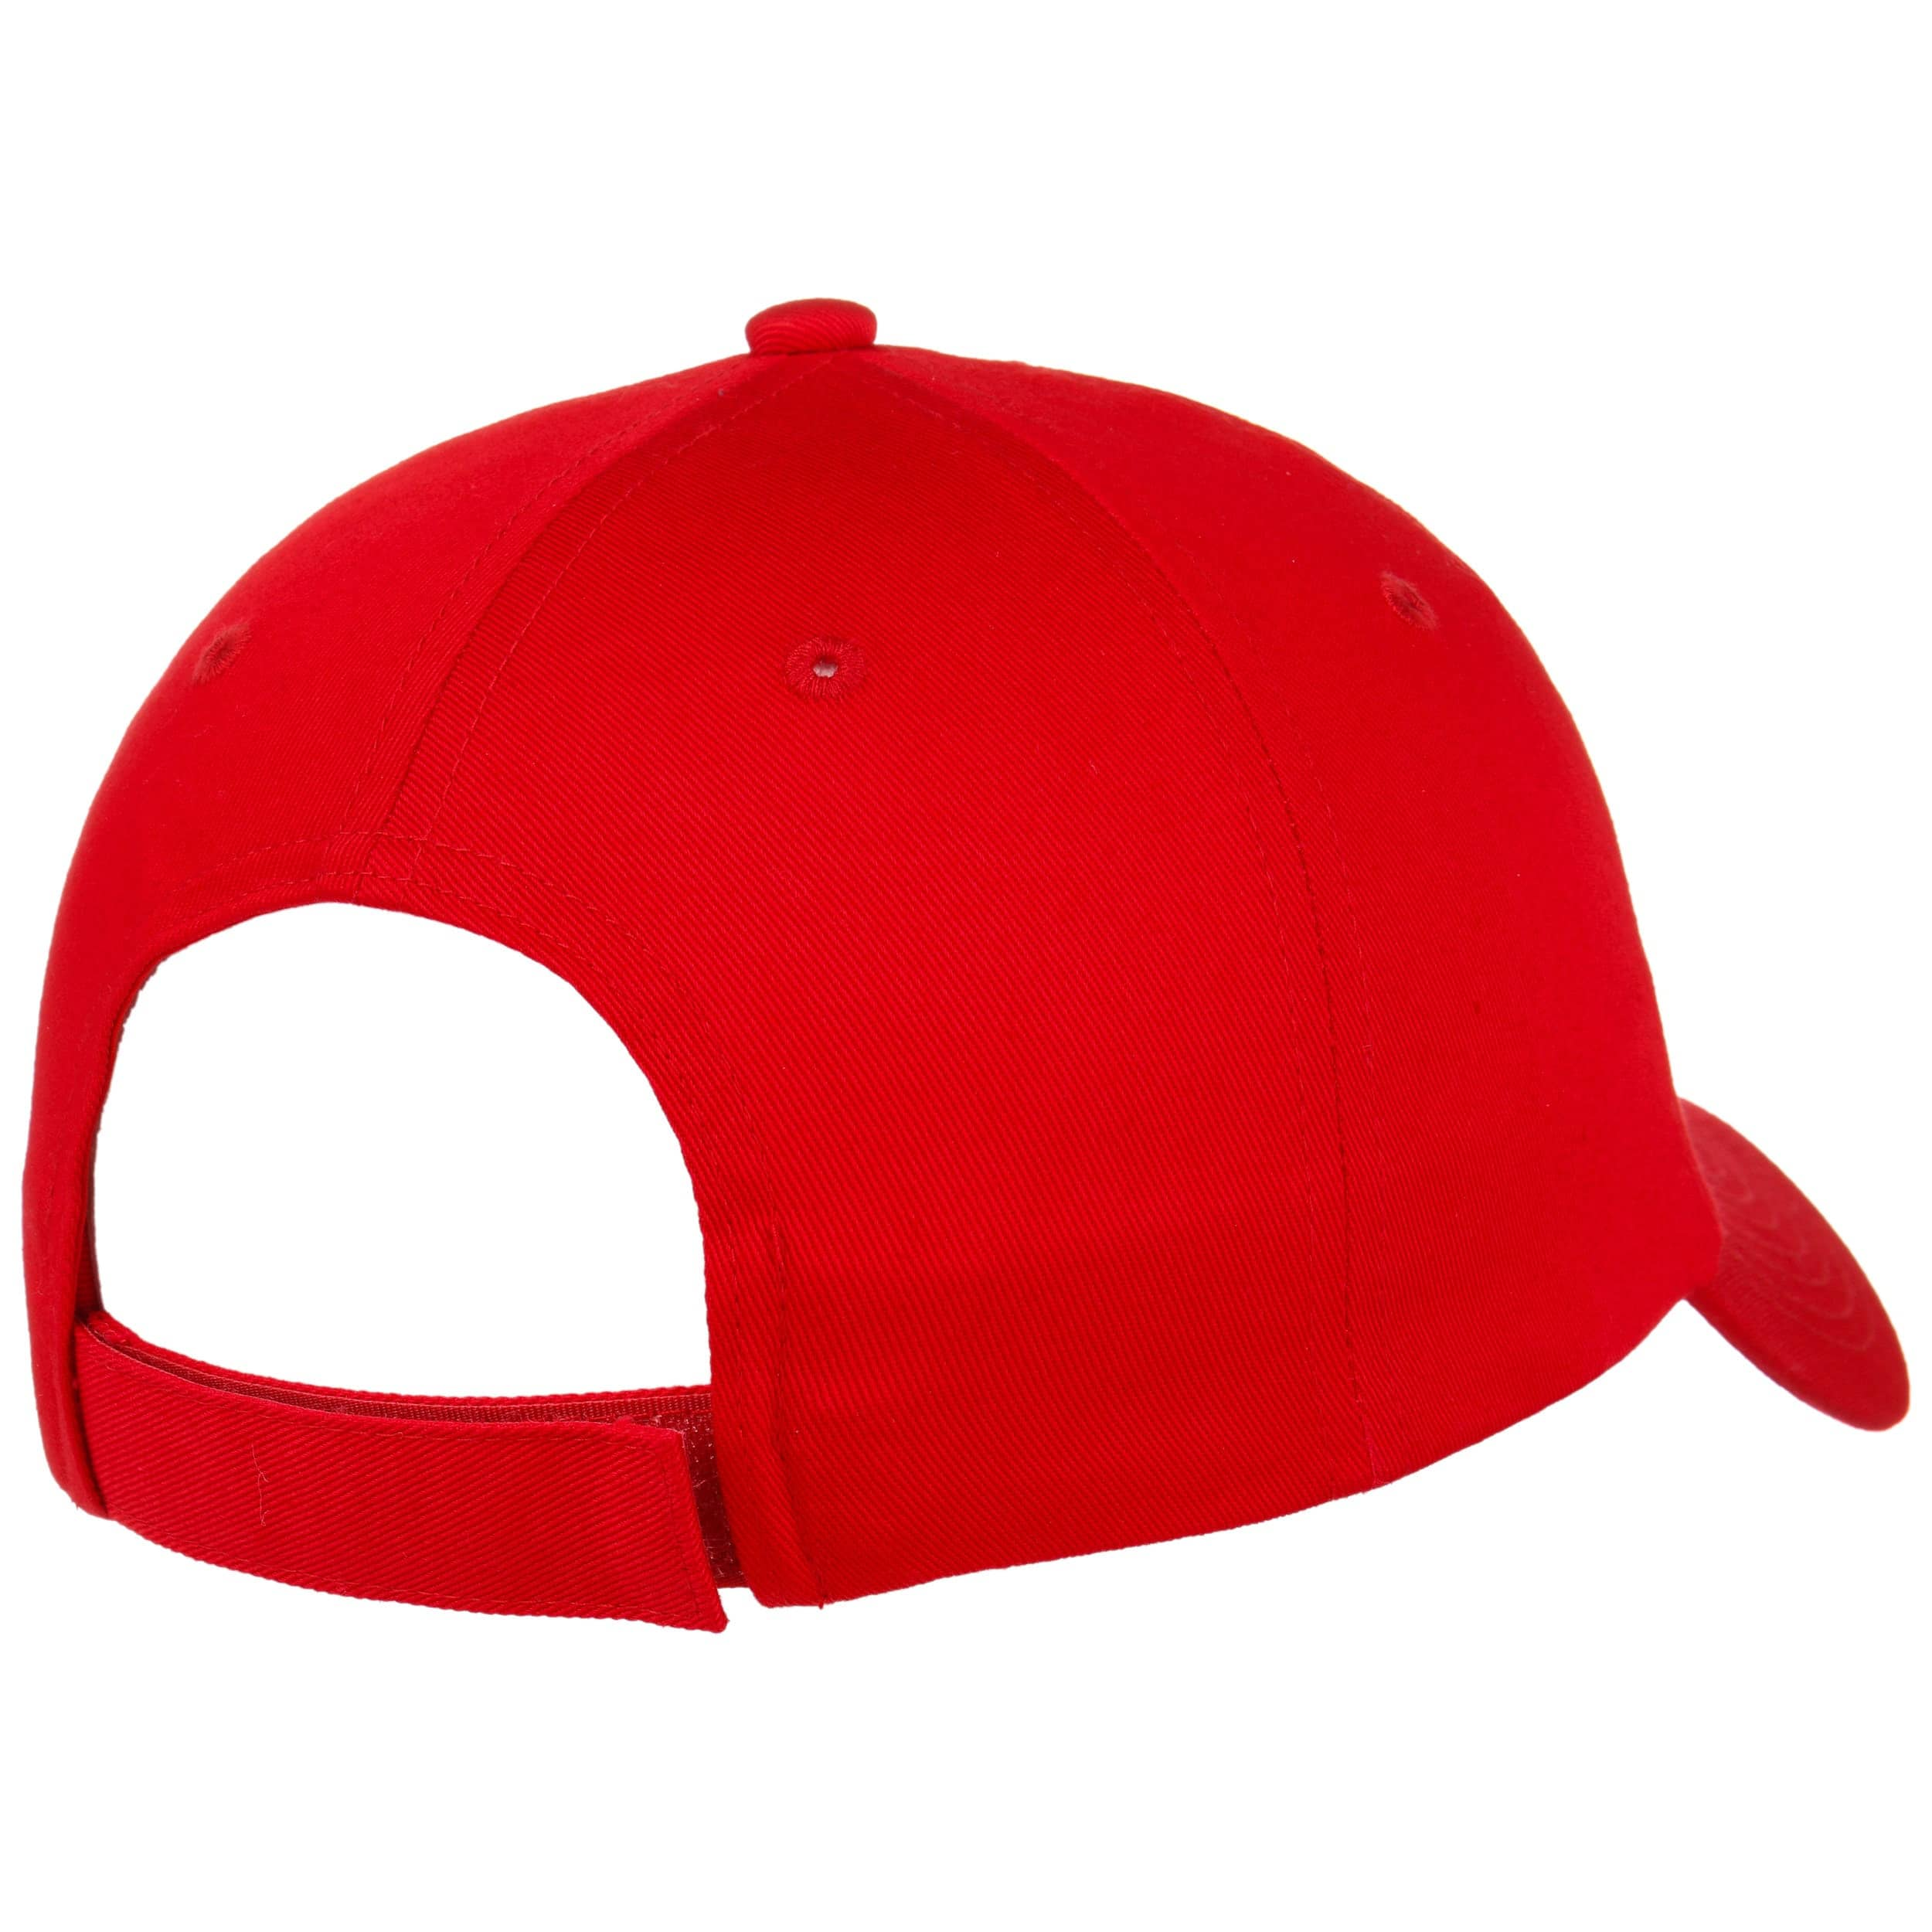 62ea0f22872 1 Baseball Cap by PUMA - red 3 ...